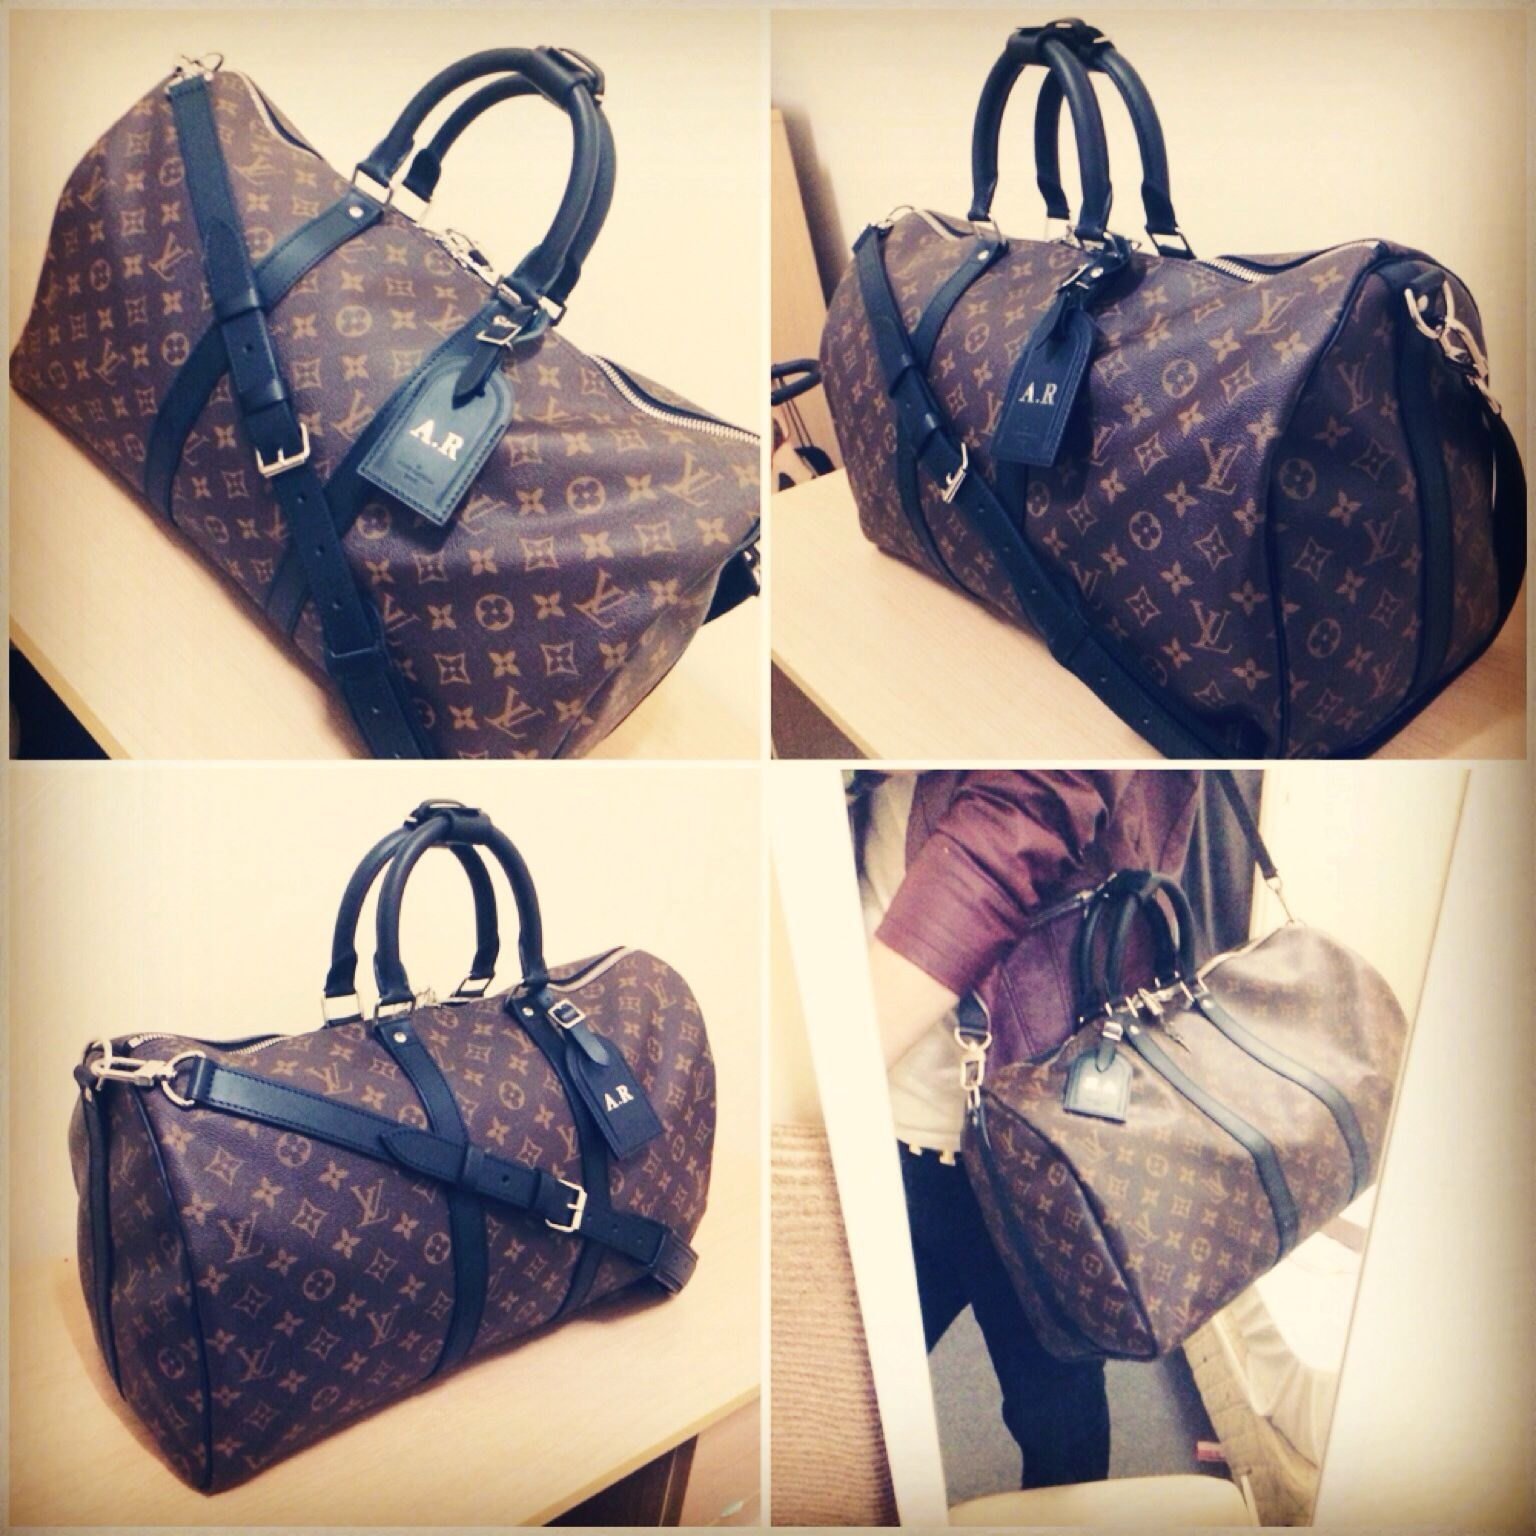 e96c87e9b My new Louis Vuitton Keepall 45 in Monogram Macassar. | Every man ...